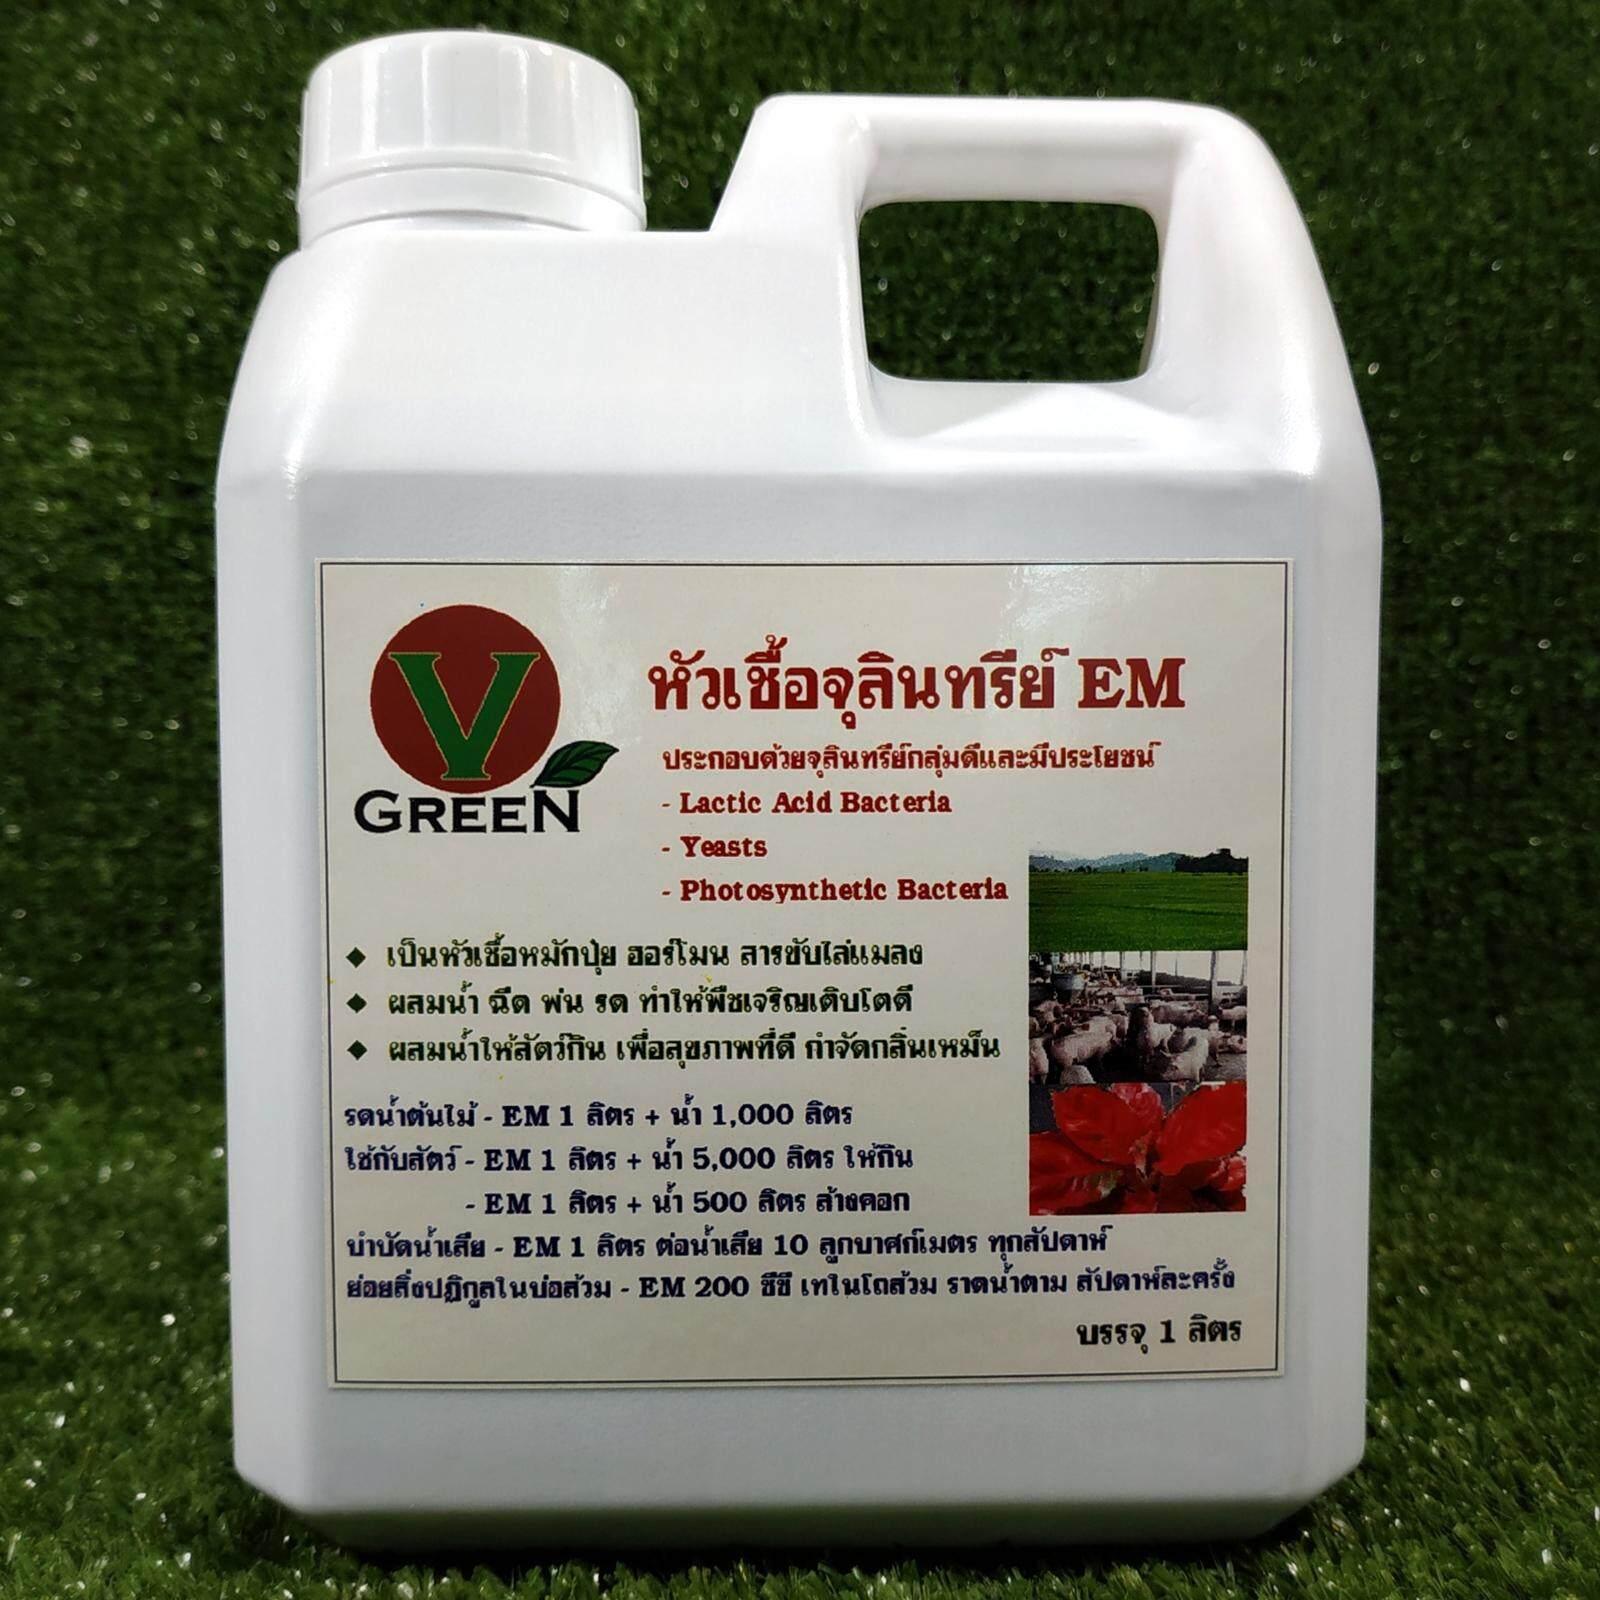 V-Green หัวเชื้อจุลินทรีย์อีเอ็ม Em ขนาด 1 ลิตร By V-Green.